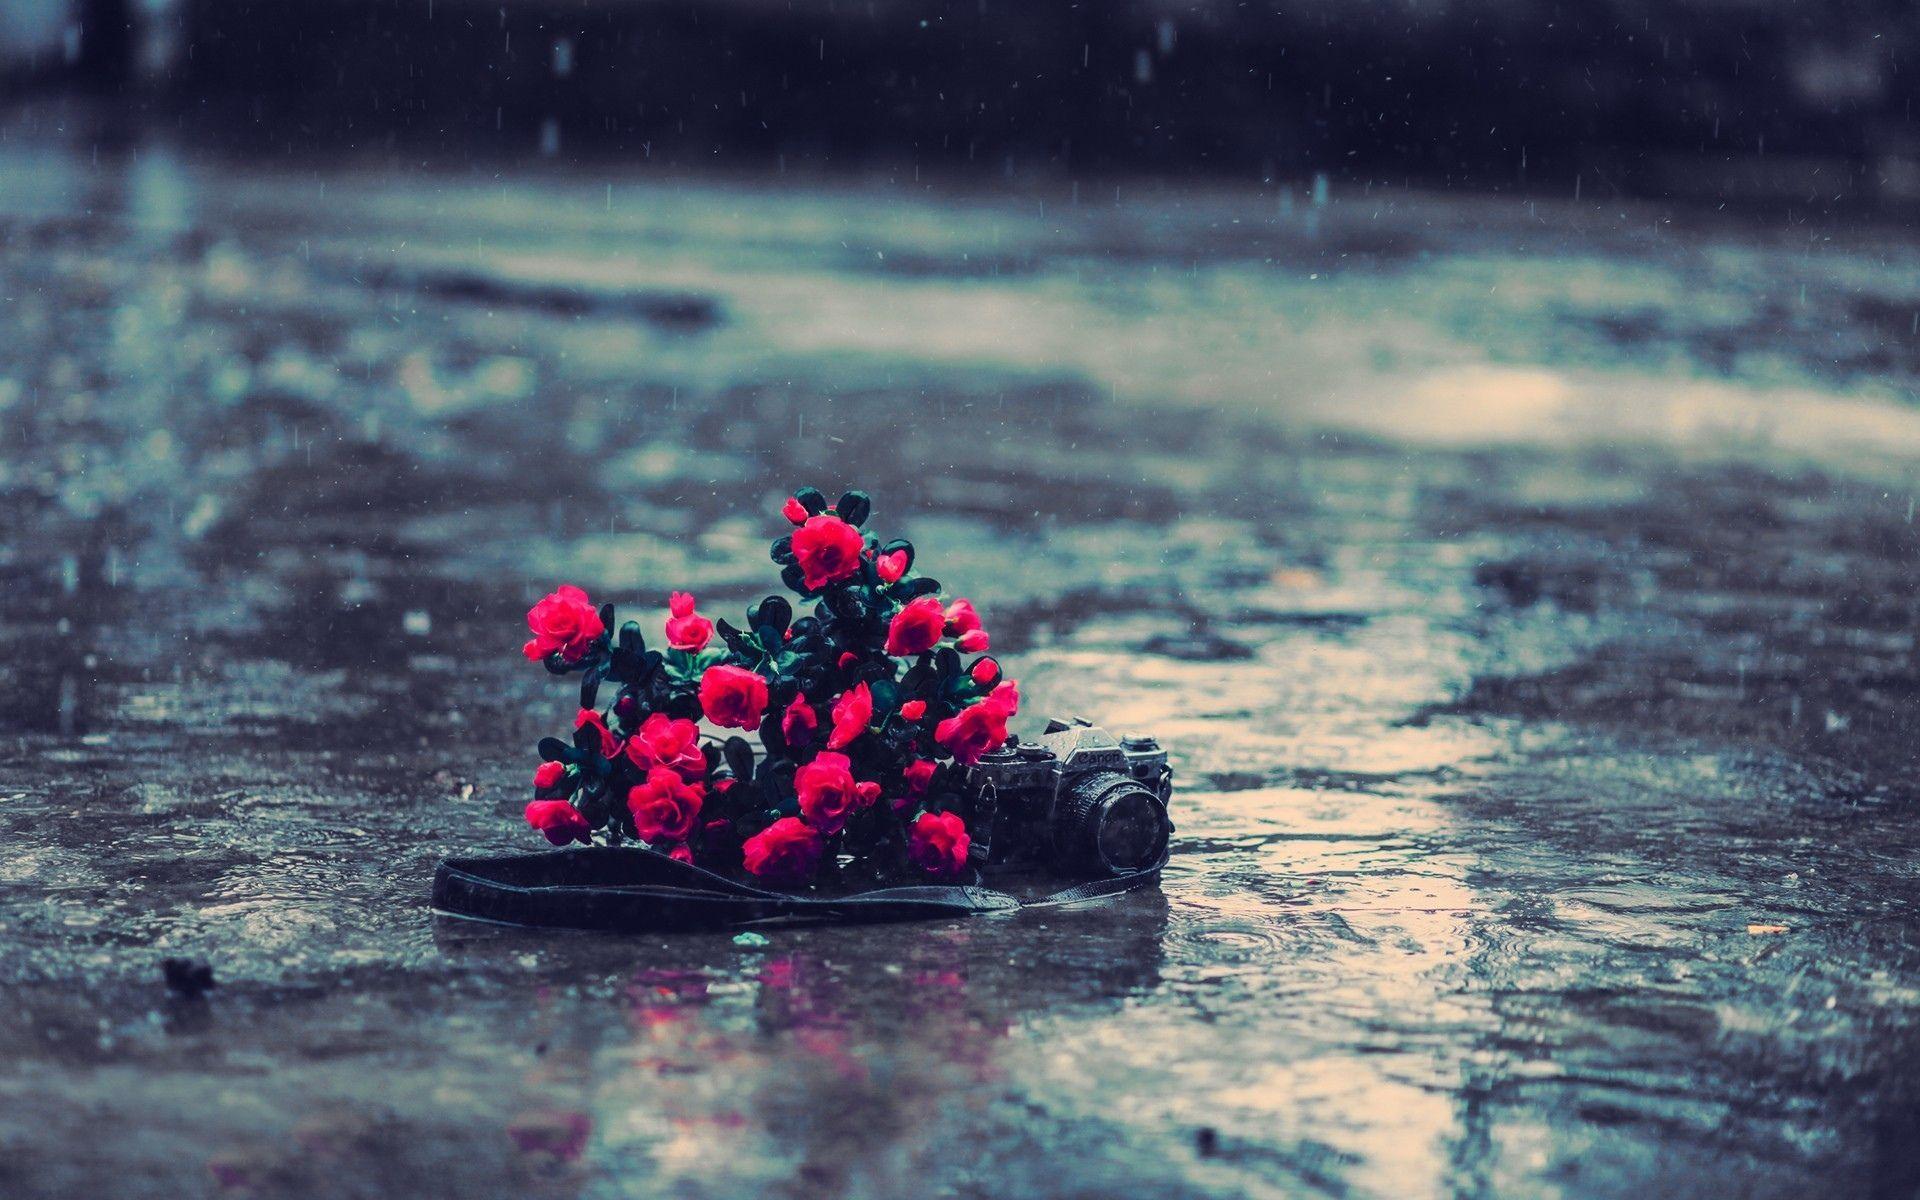 Hd wallpaper rain - Hd Rain Backgrounds Wallpapers 9